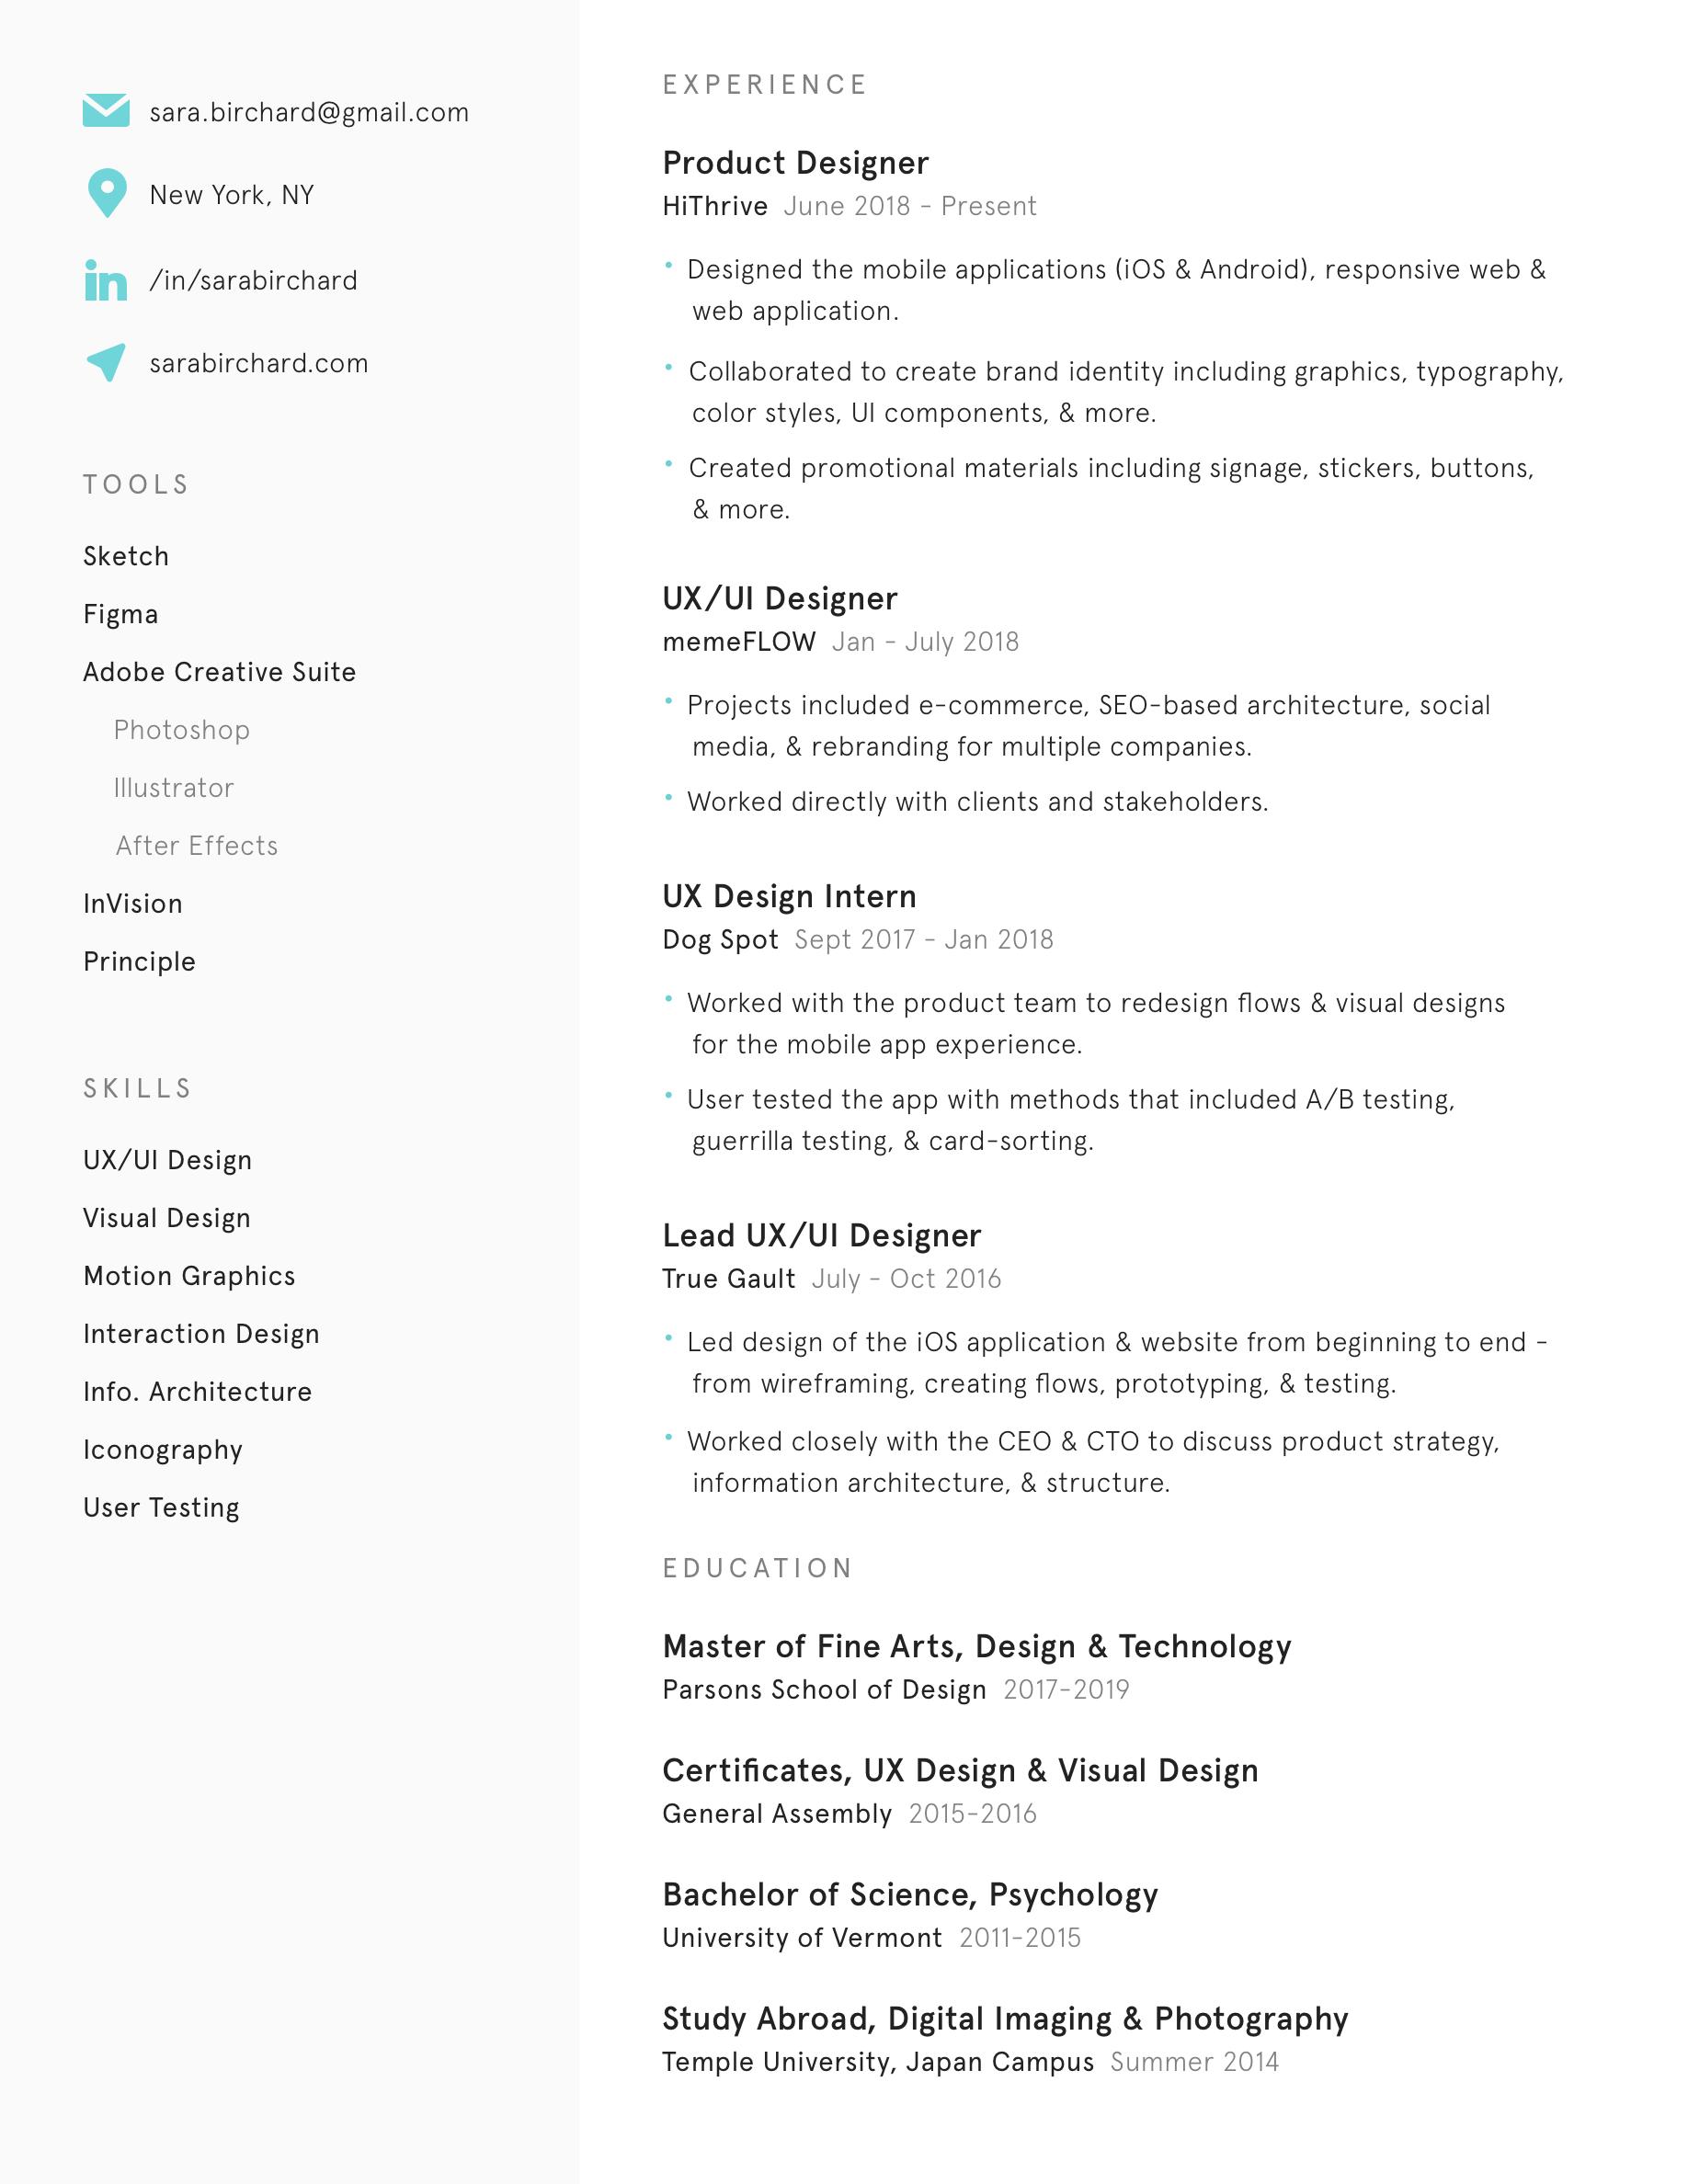 Birchard_Resume.png